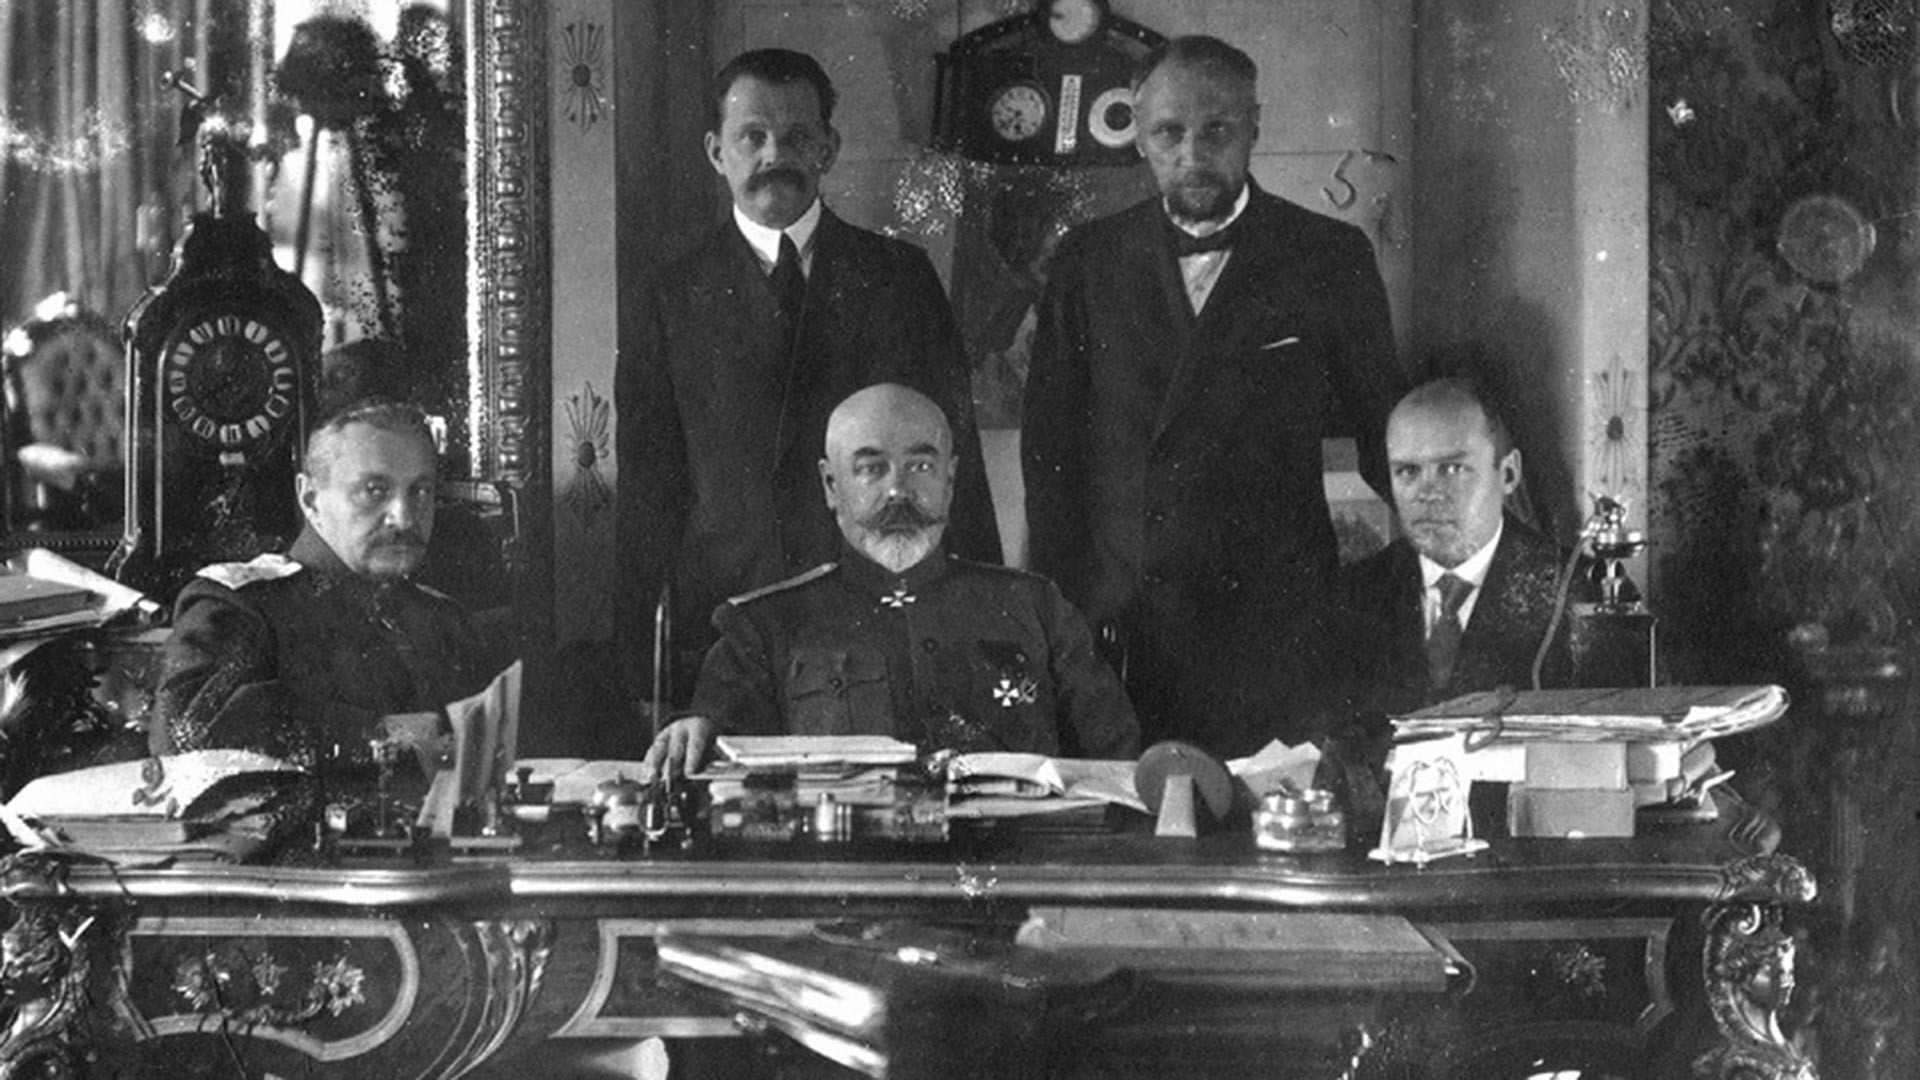 Taganrog, poleti 1919. Od desne proti levi: general I. P. Romanovski, general A. I. Denikin, K. N. Sokolov. Stojé: N. I. Astrov, N. V. Savič